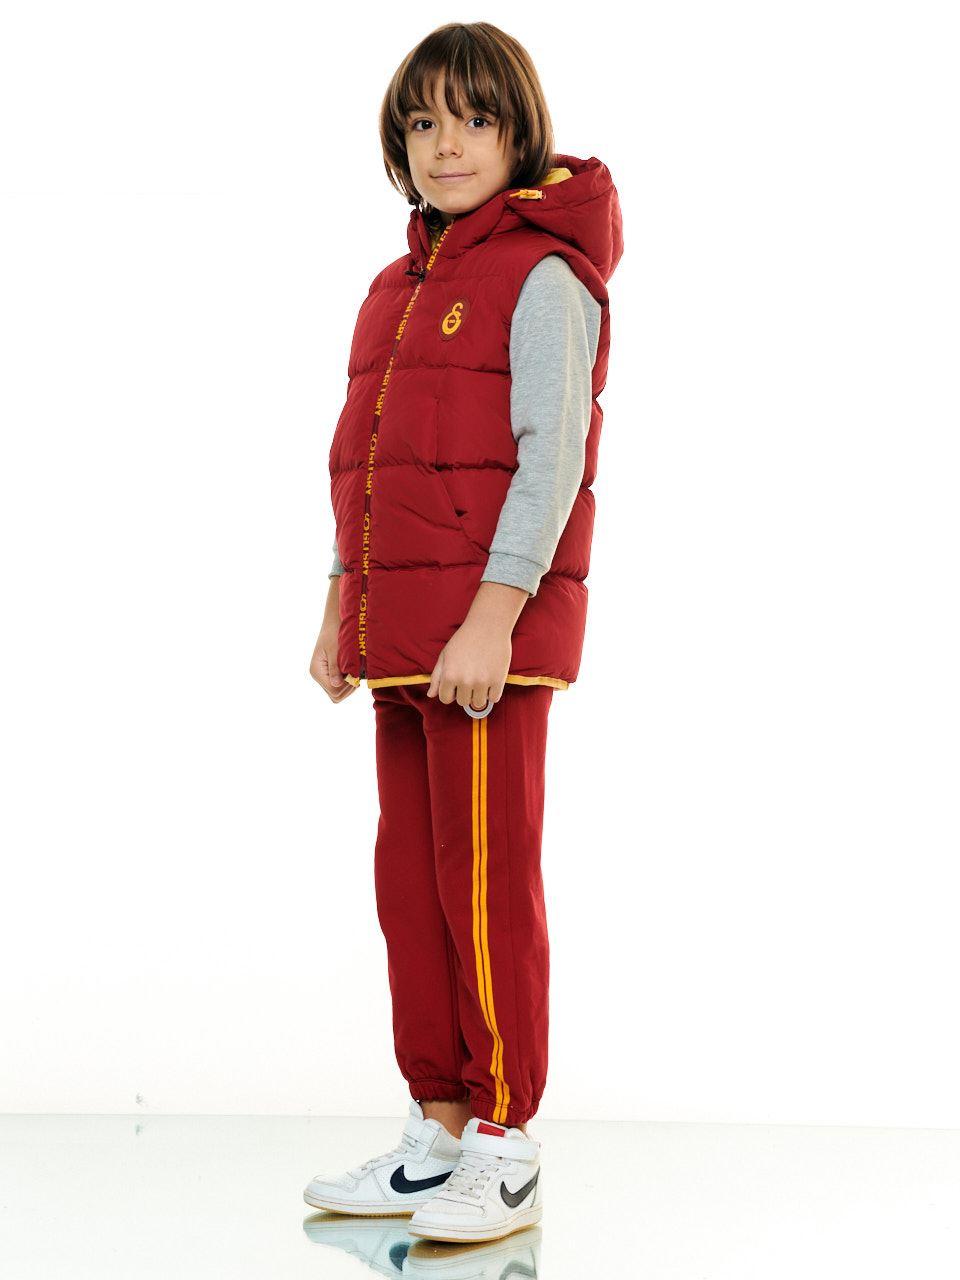 Galatasaray Çocuk Yelek C202035